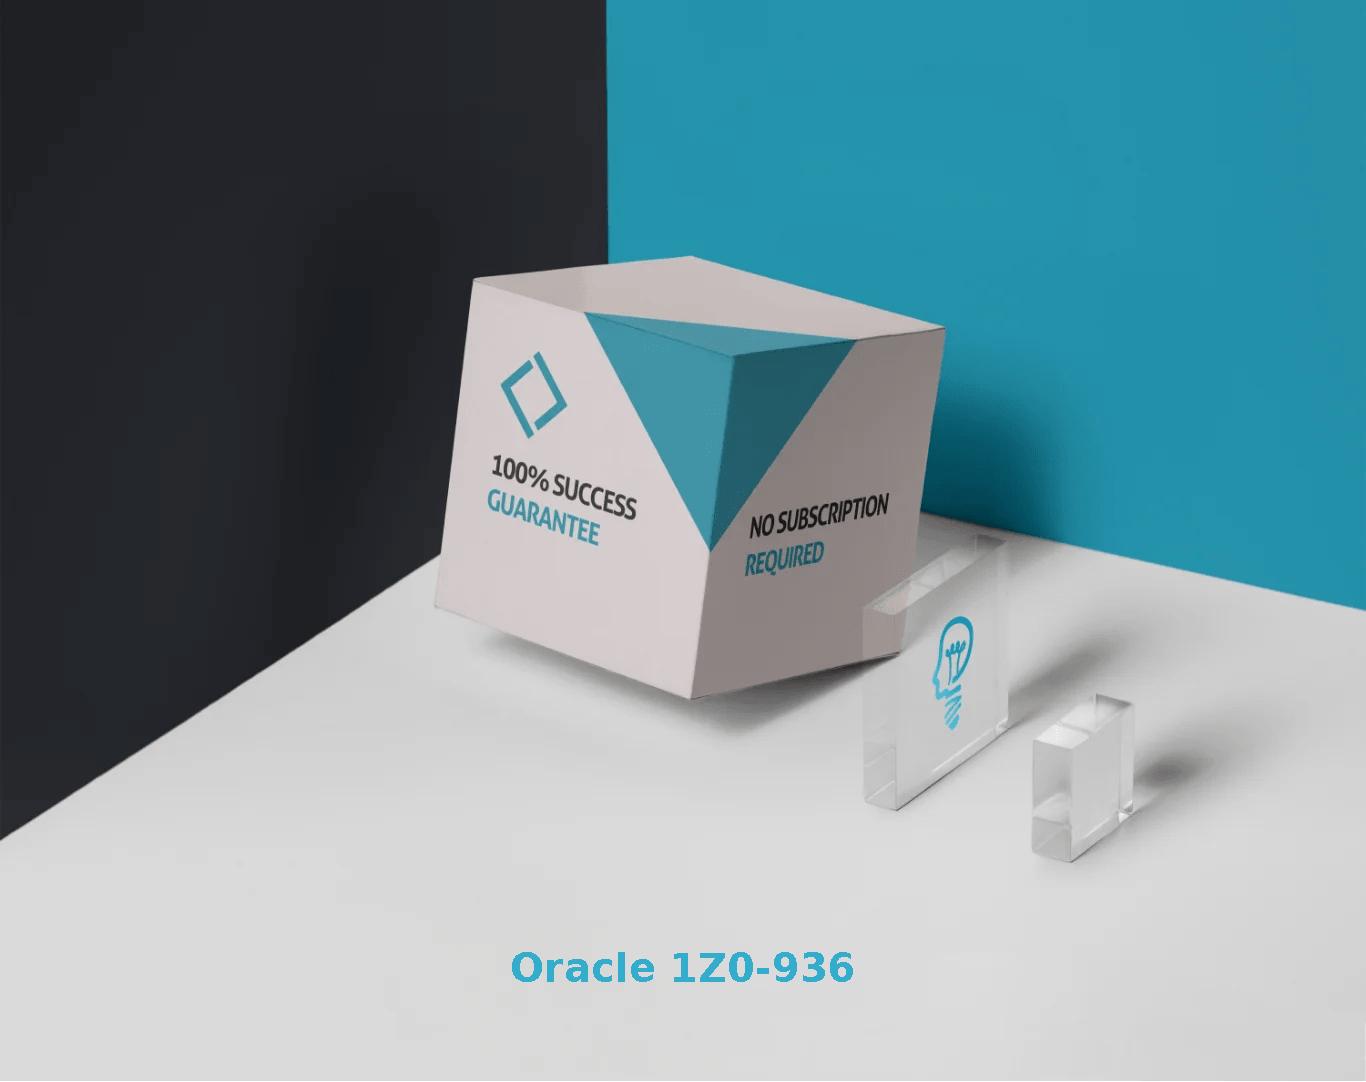 Oracle 1Z0-936 Exams